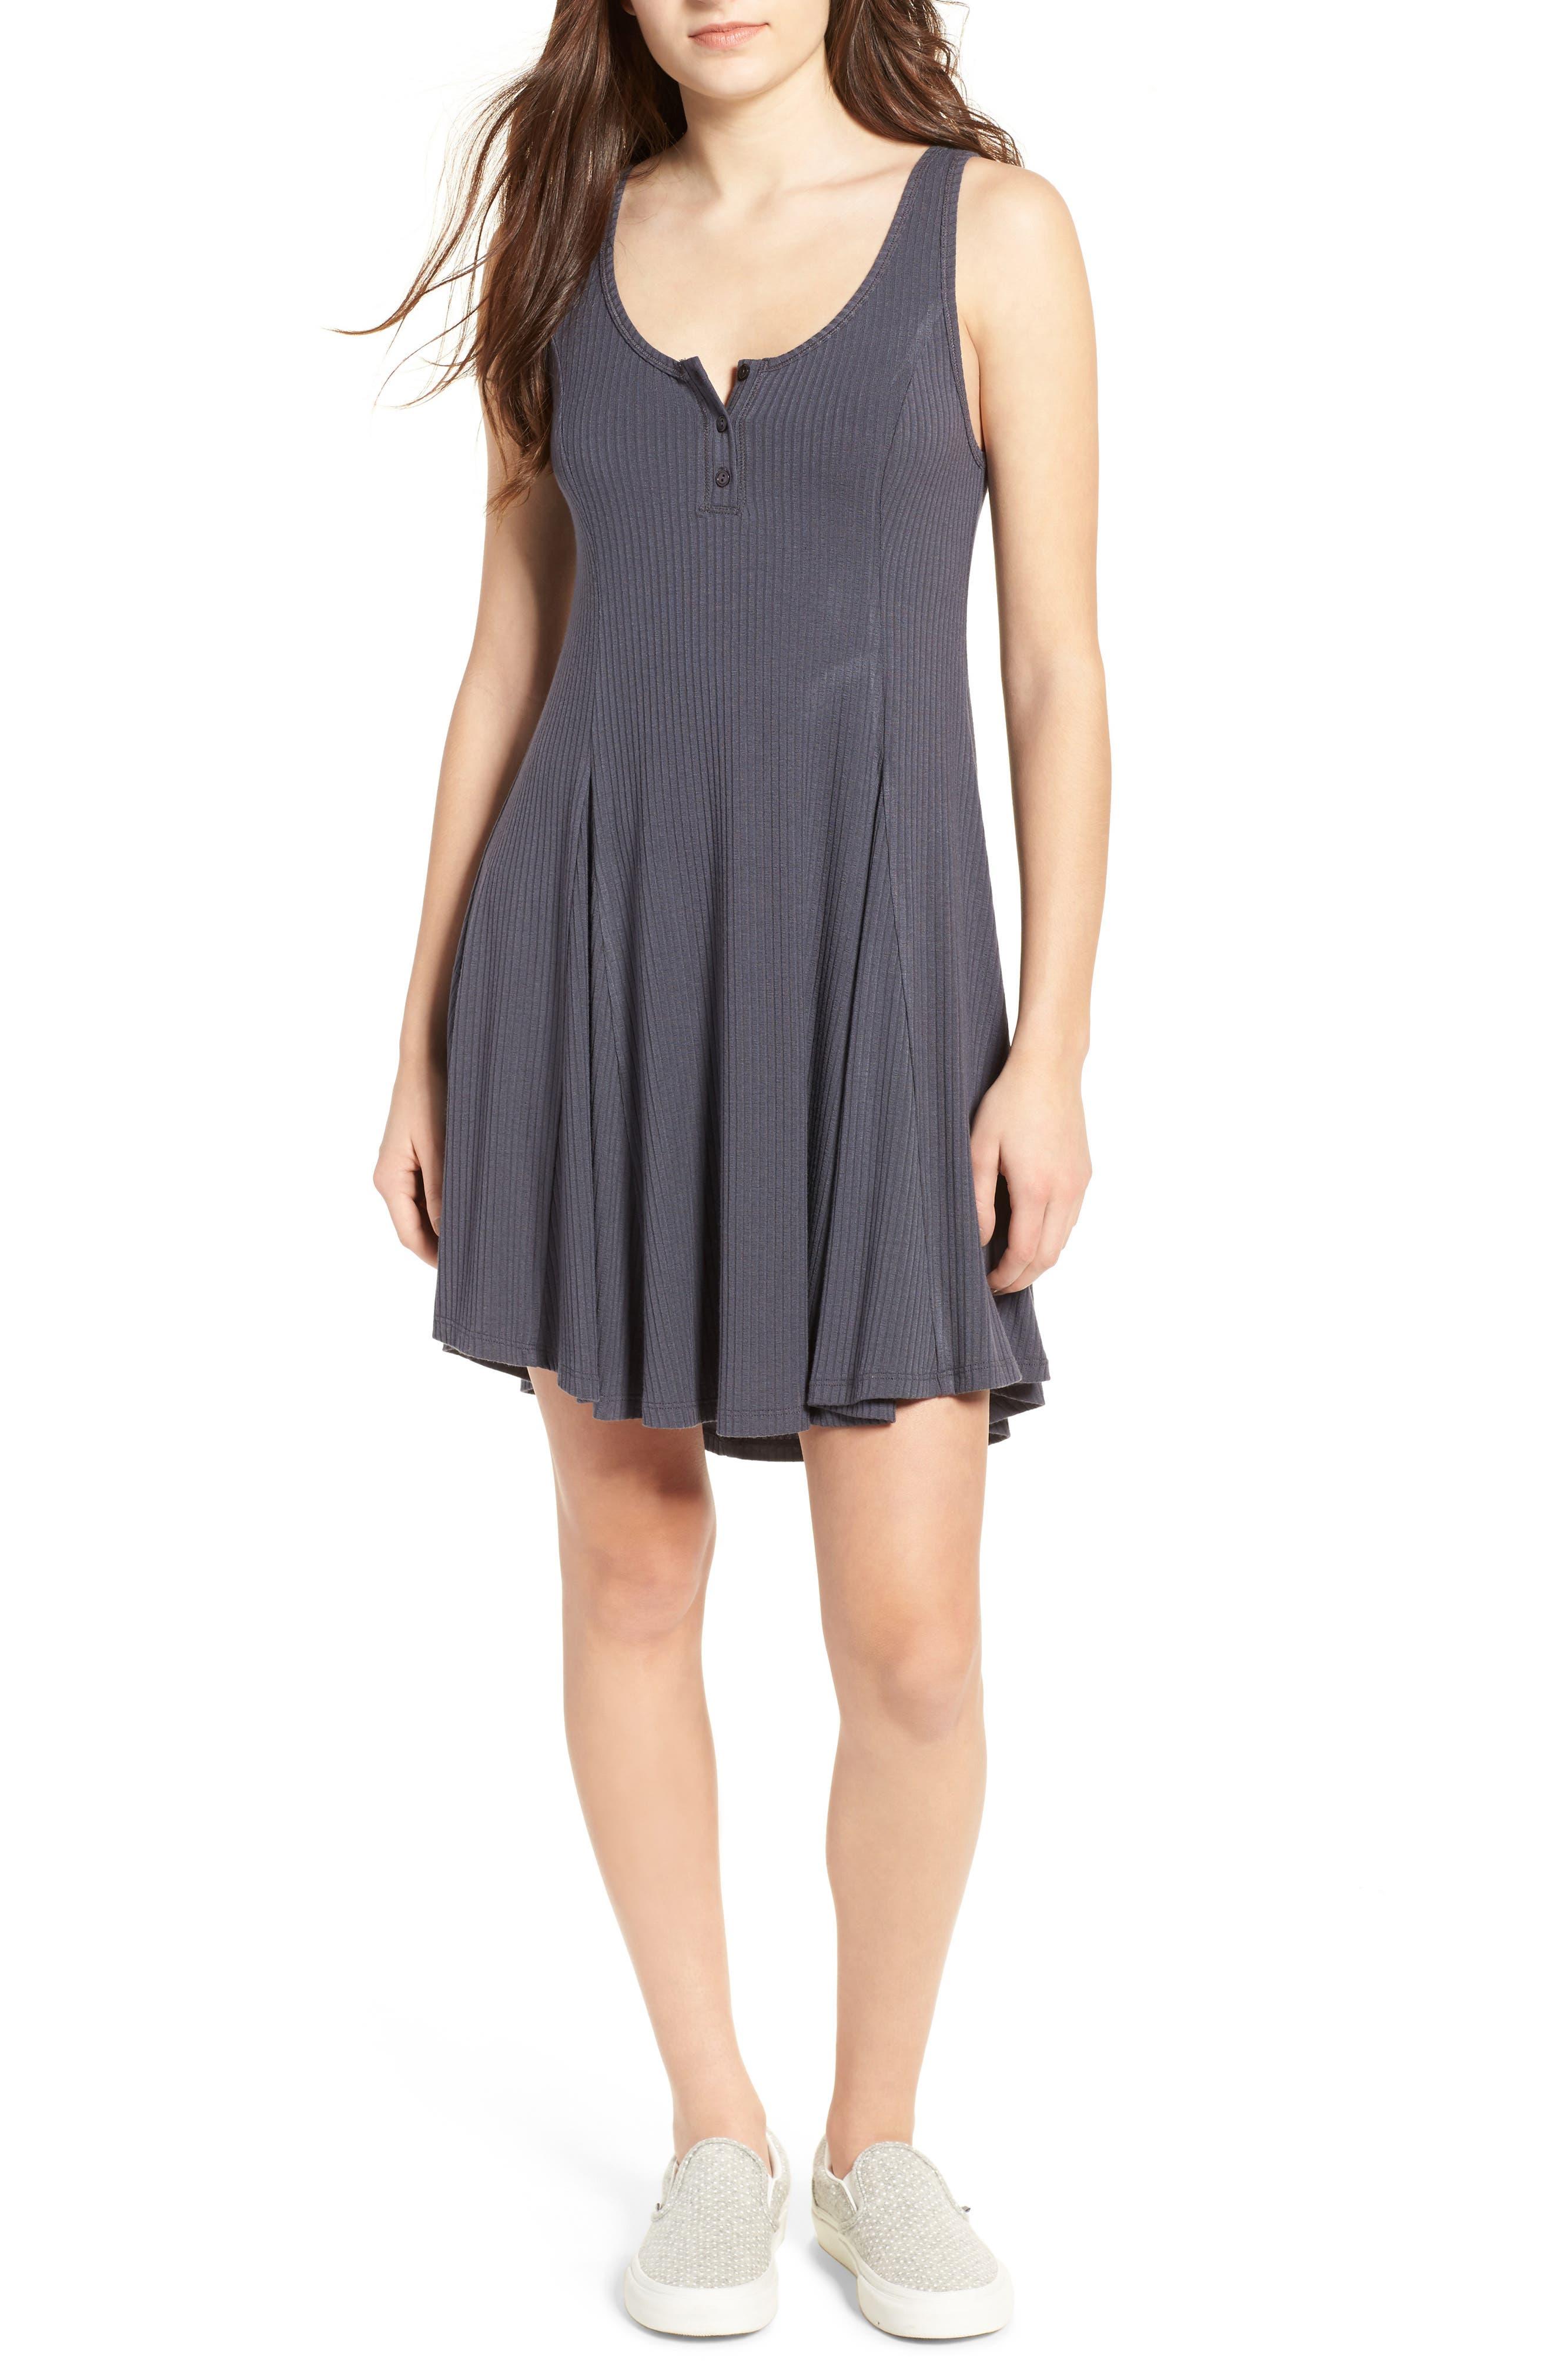 Main Image - Lush Ribbed Skater Dress